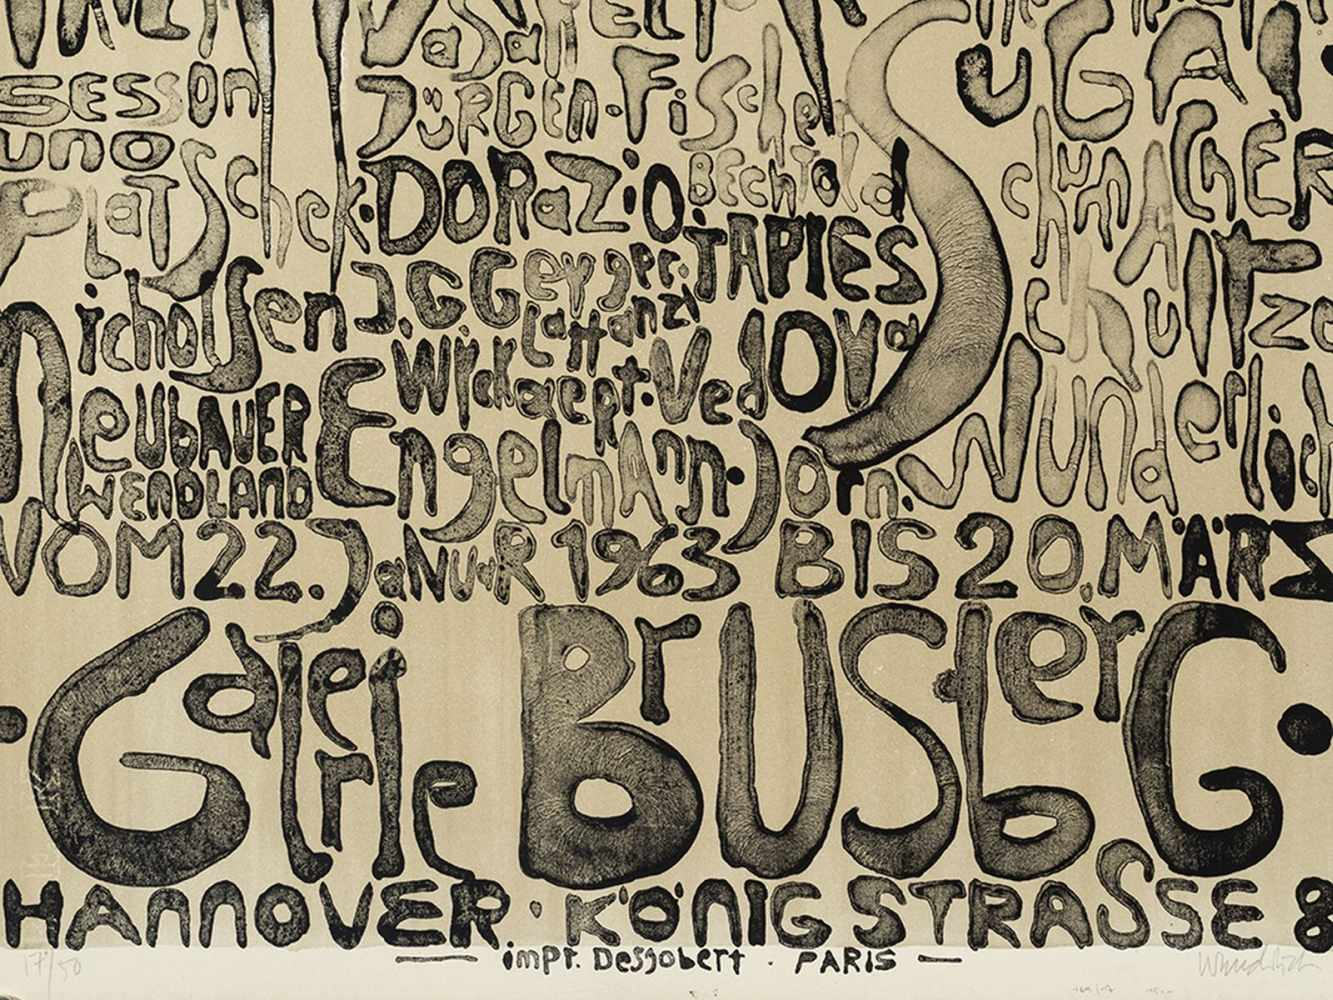 Paul Wunderlich, Kunst + Knoll International, Poster, 1963 - Image 6 of 9